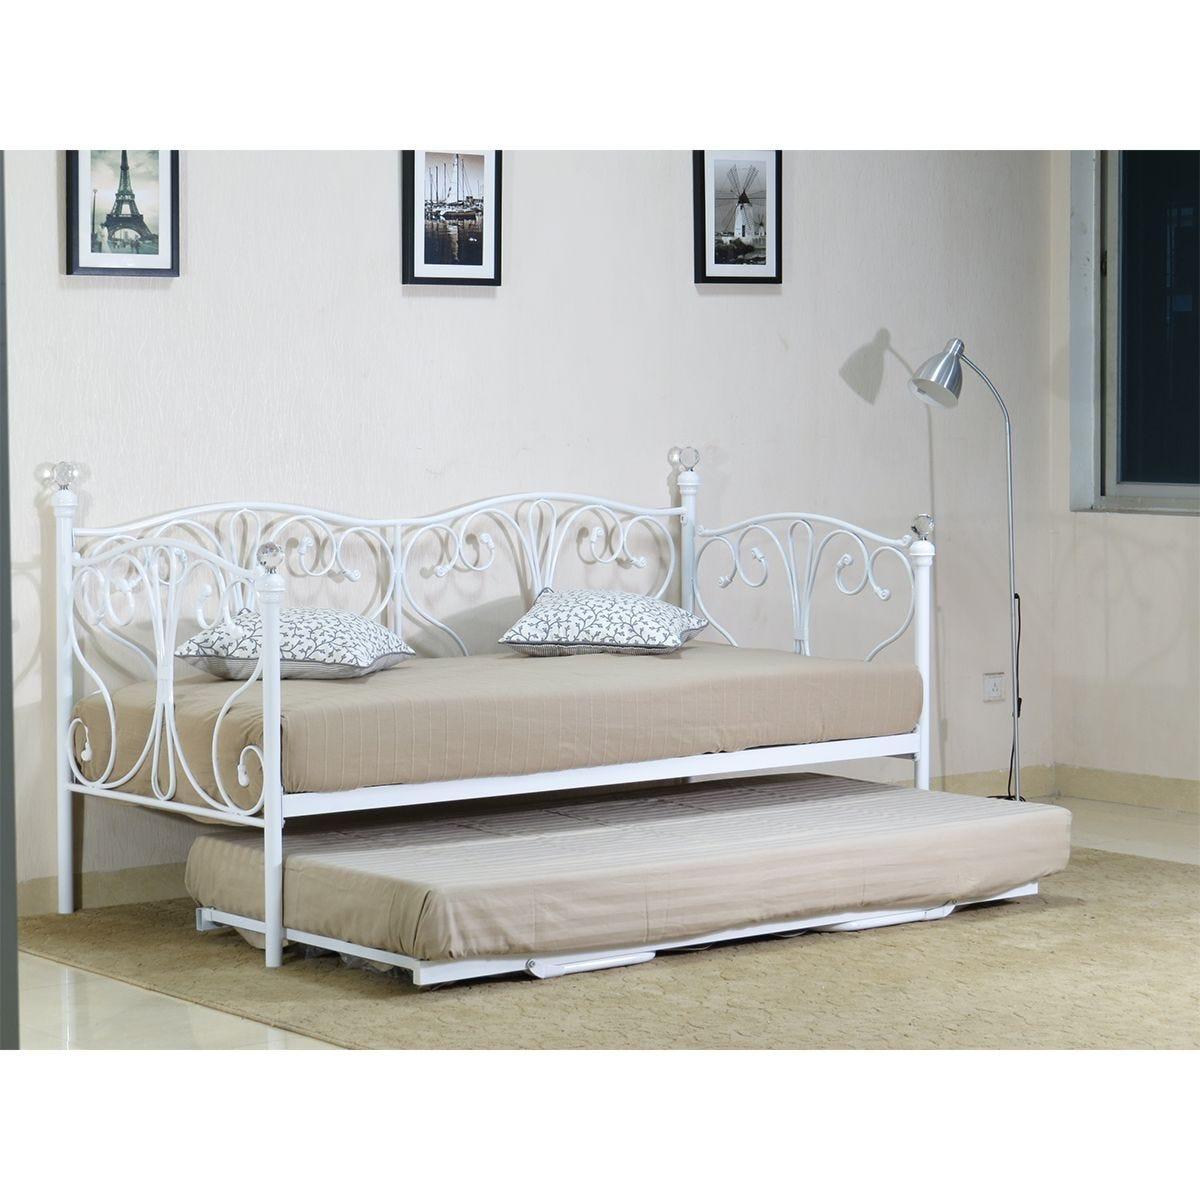 Iris Day Bed - White